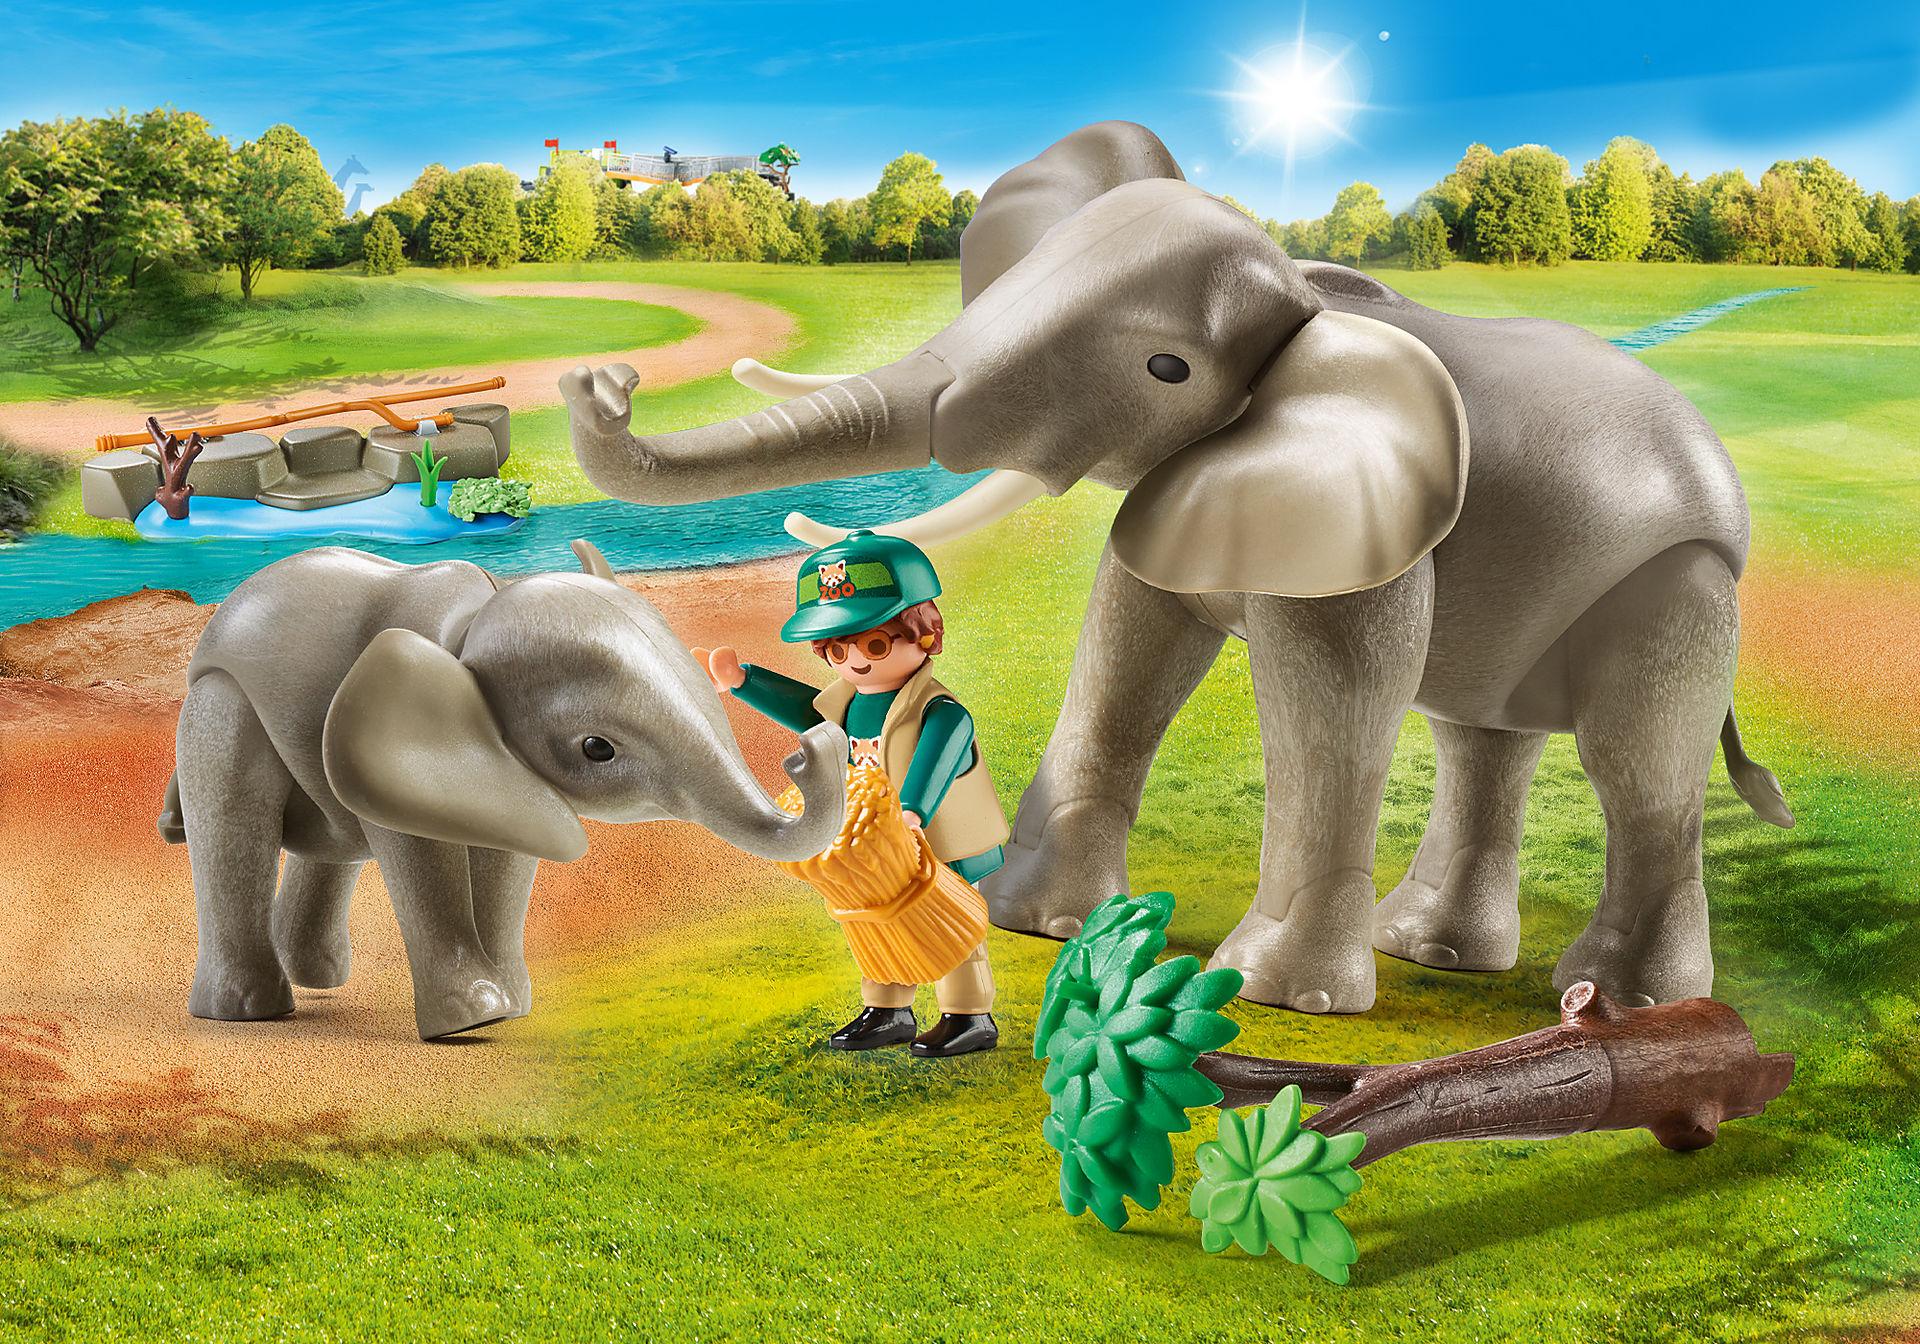 70324 Elefanten im Freigehege zoom image1